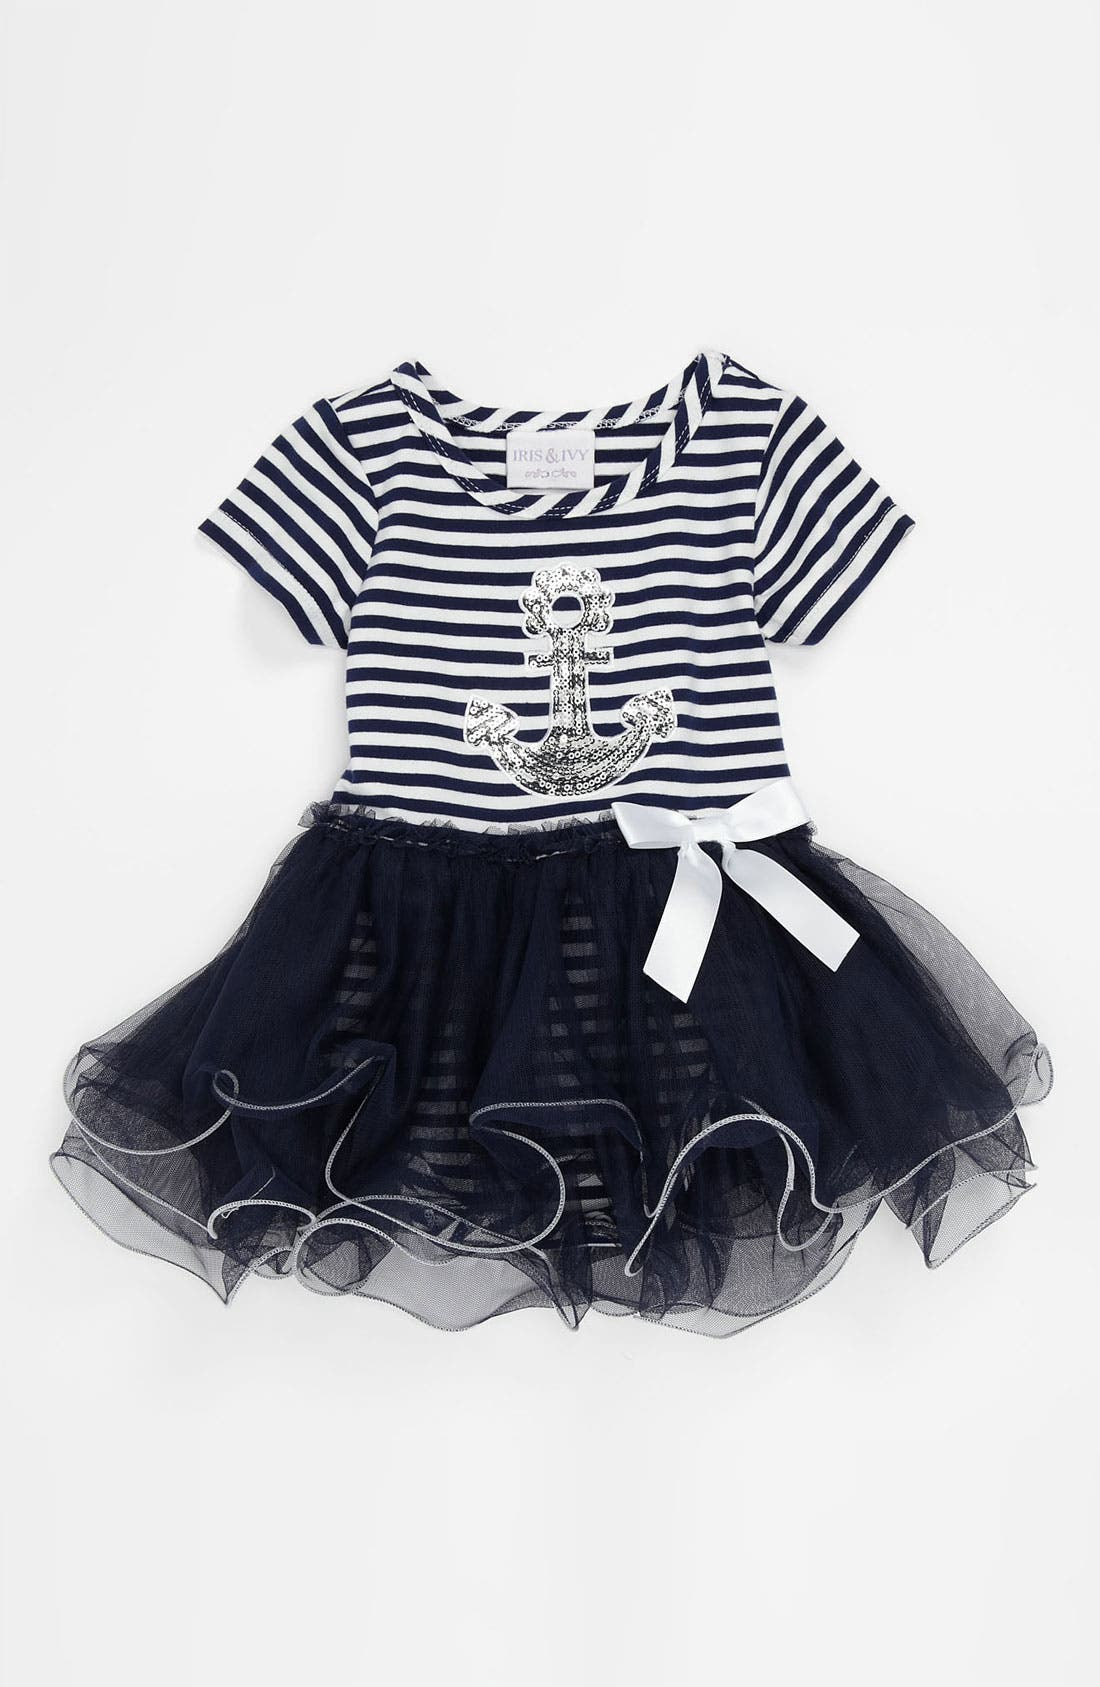 Main Image - Iris & Ivy Tutu Dress (Infant)